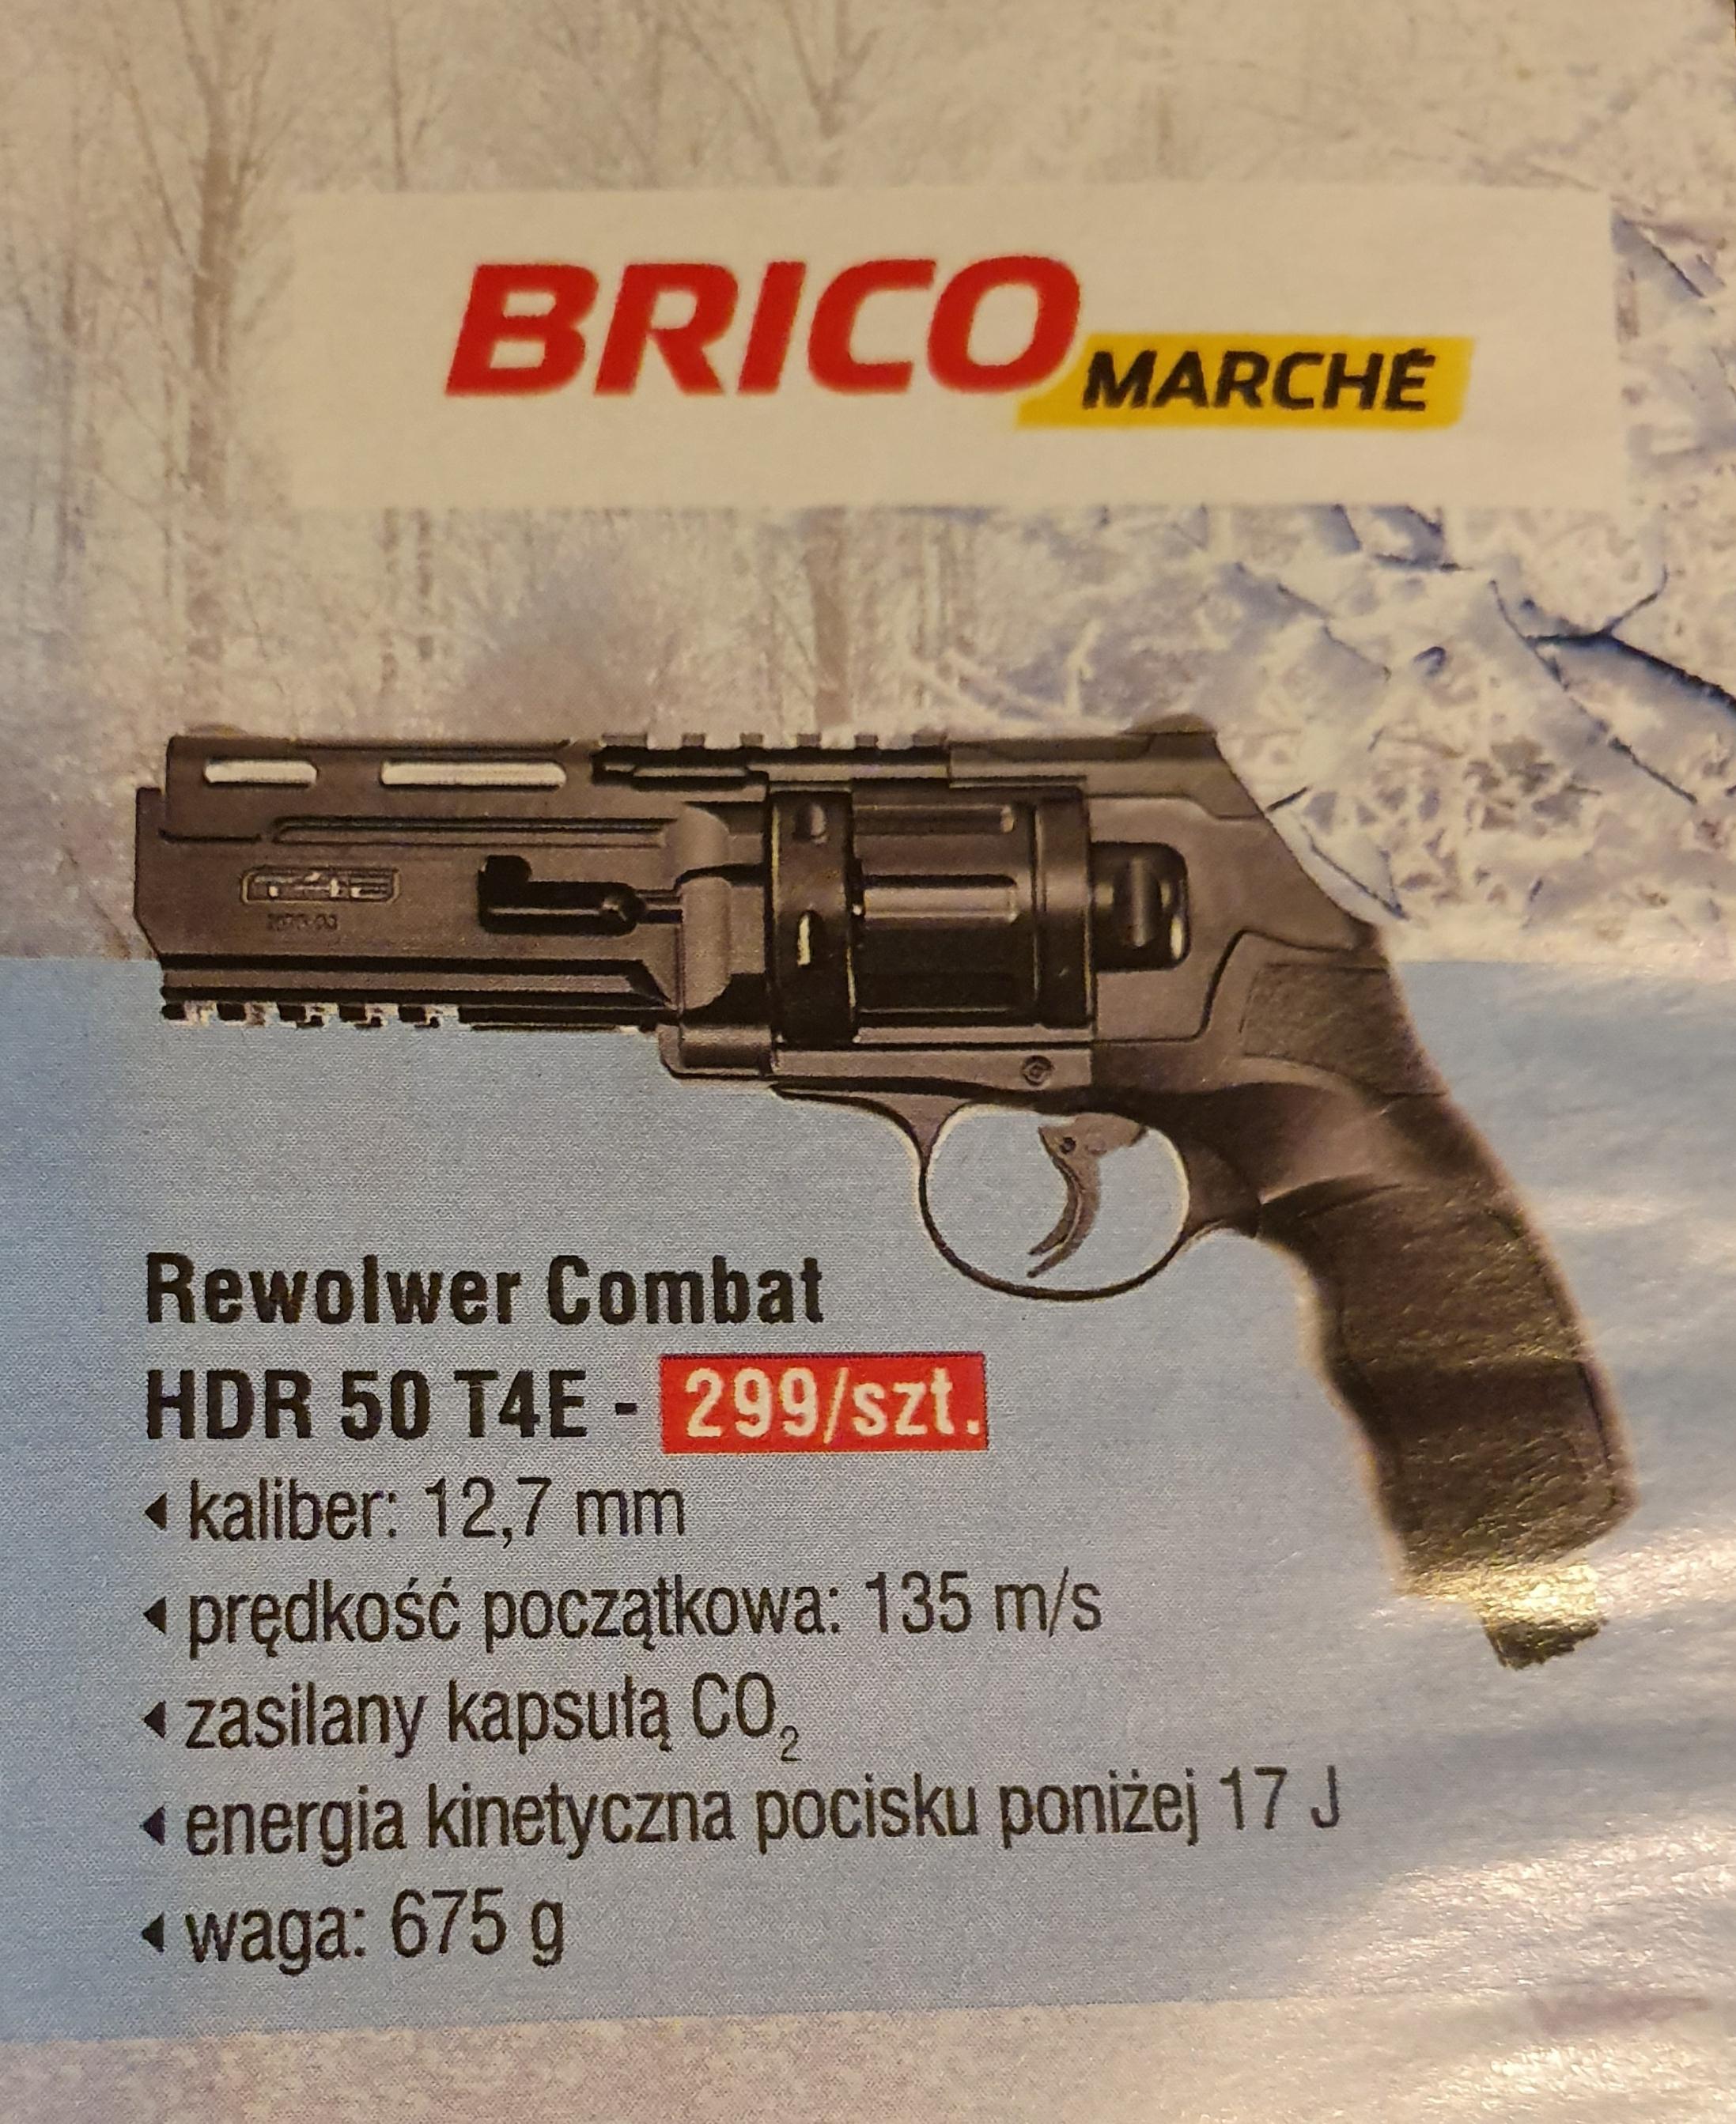 Rewolwer CO2 RAM Combat HDR 50 T4E na kule gumowe #BricoMarche